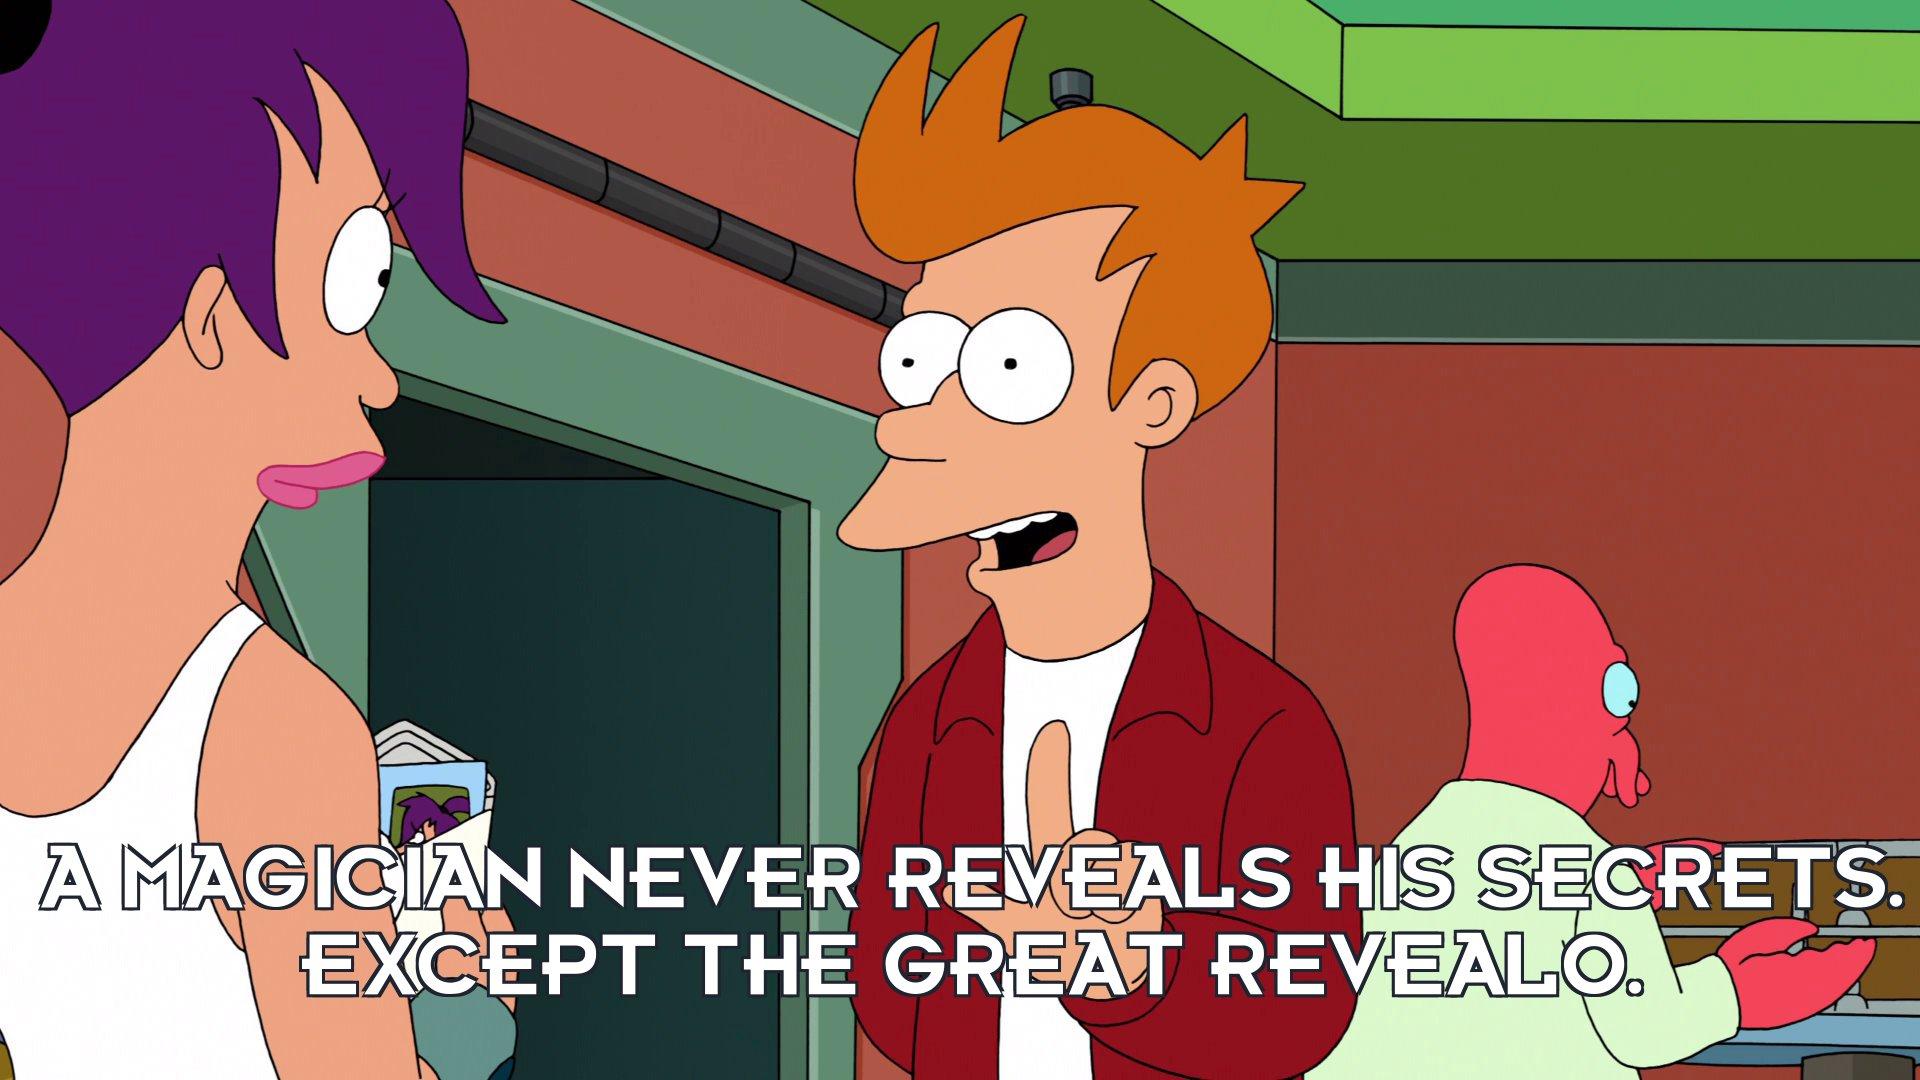 Philip J Fry: A magician never reveals his secrets. Except the Great Revealo.